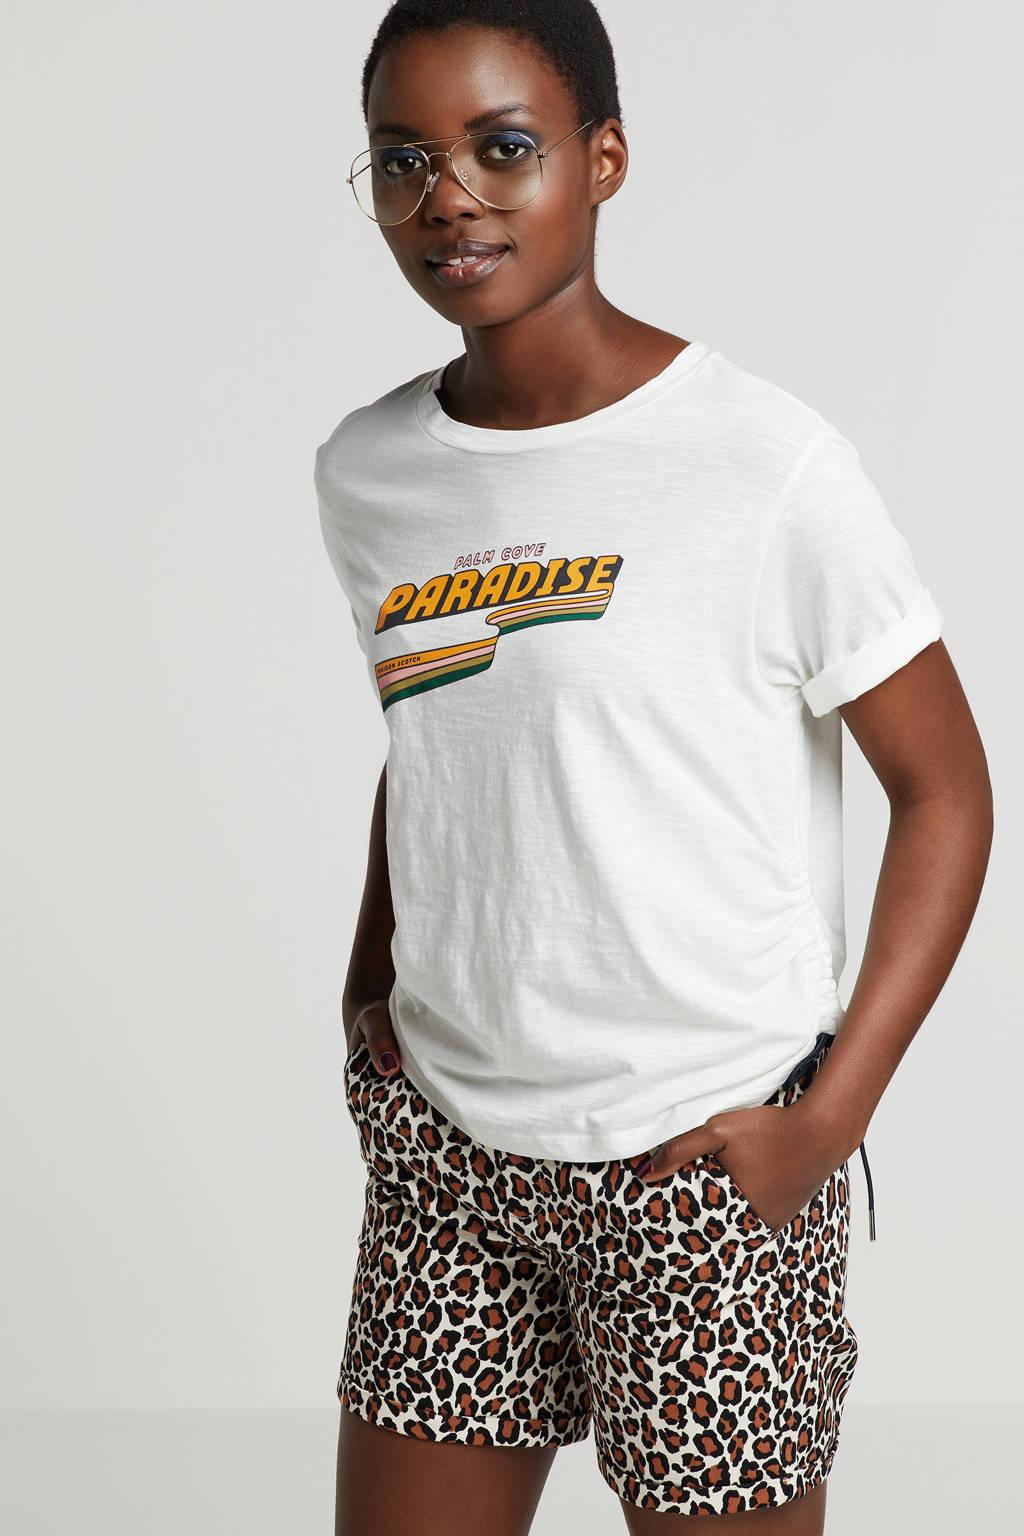 Scotch & Soda T-shirt met printopdruk, Wit/oranje/groen/roze